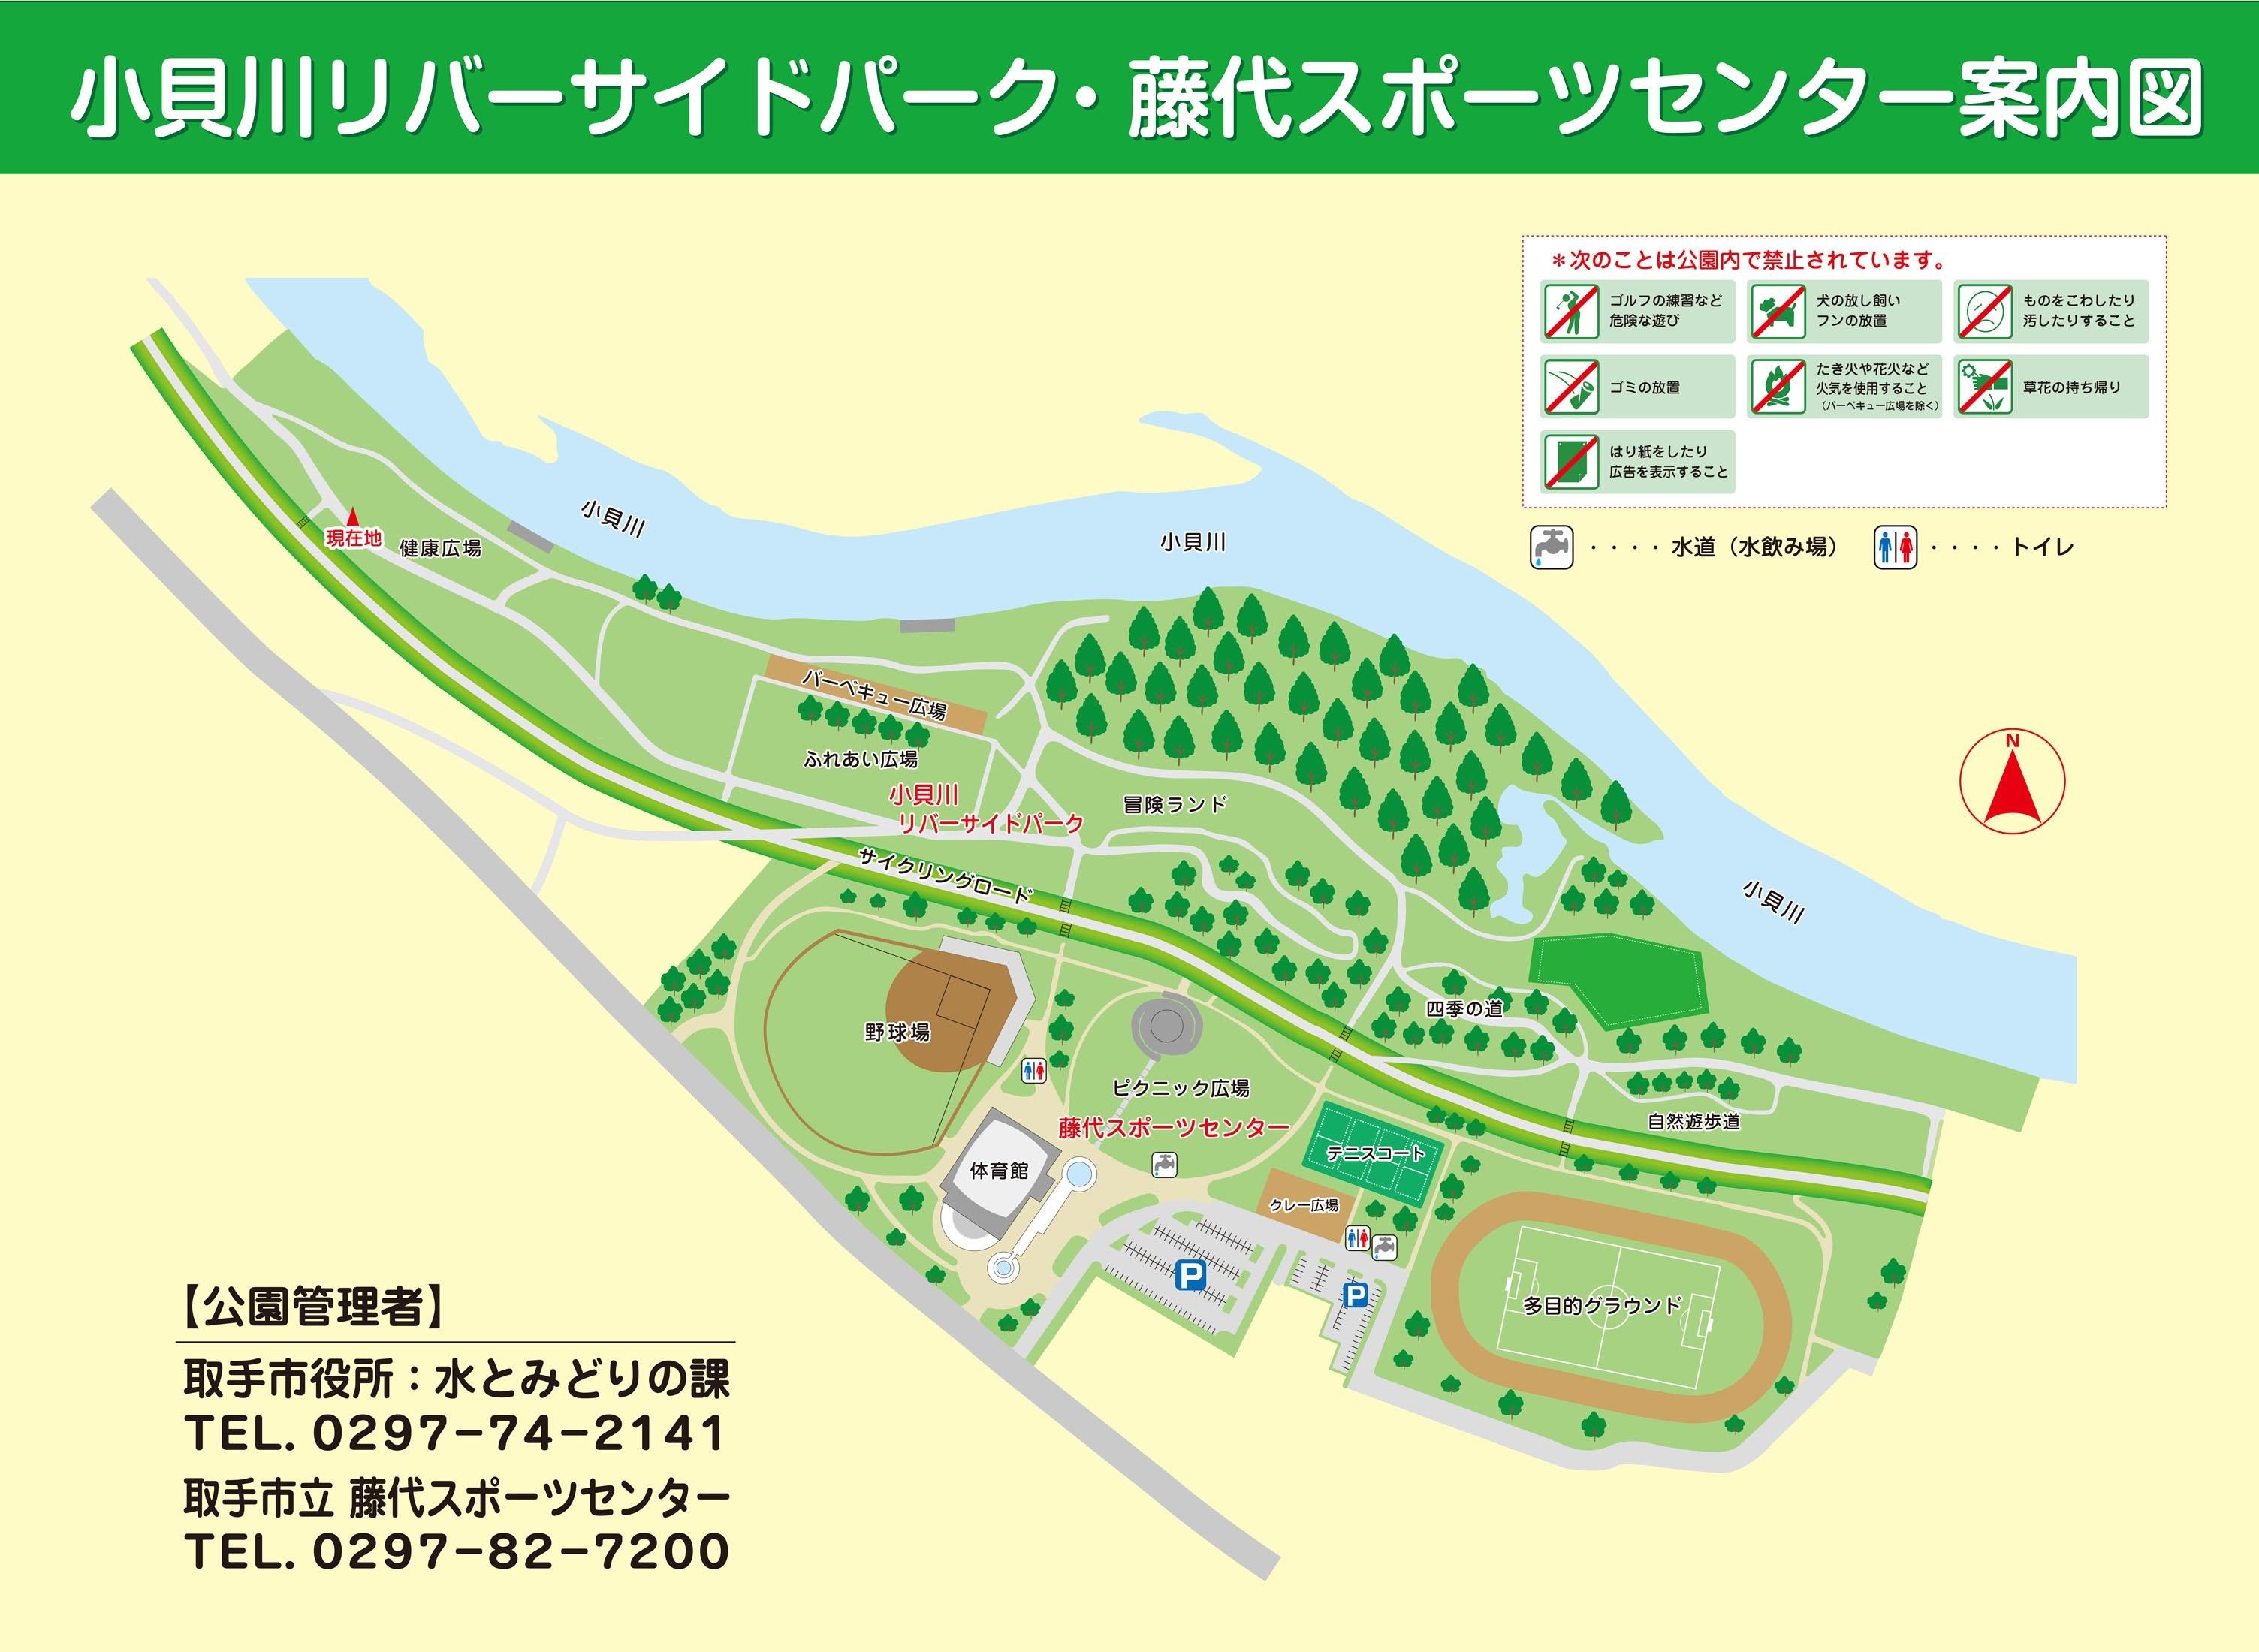 http://www.city.toride.ibaraki.jp/mizutomidori/shisetsu/documents/kokaigawaryokuti.jpg